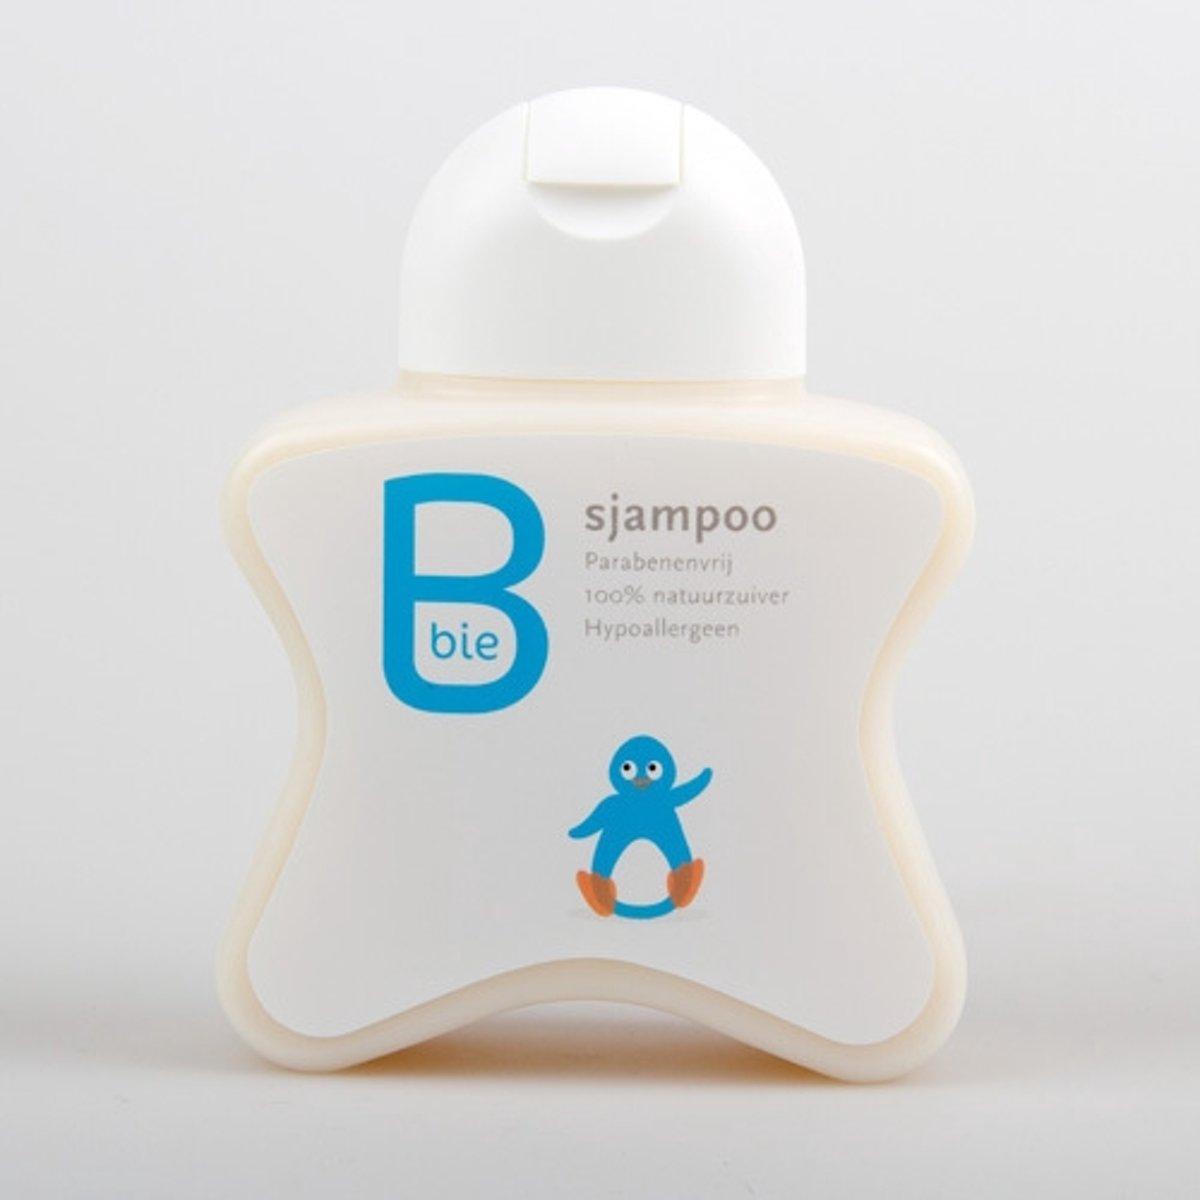 Bbie Shampoo kopen